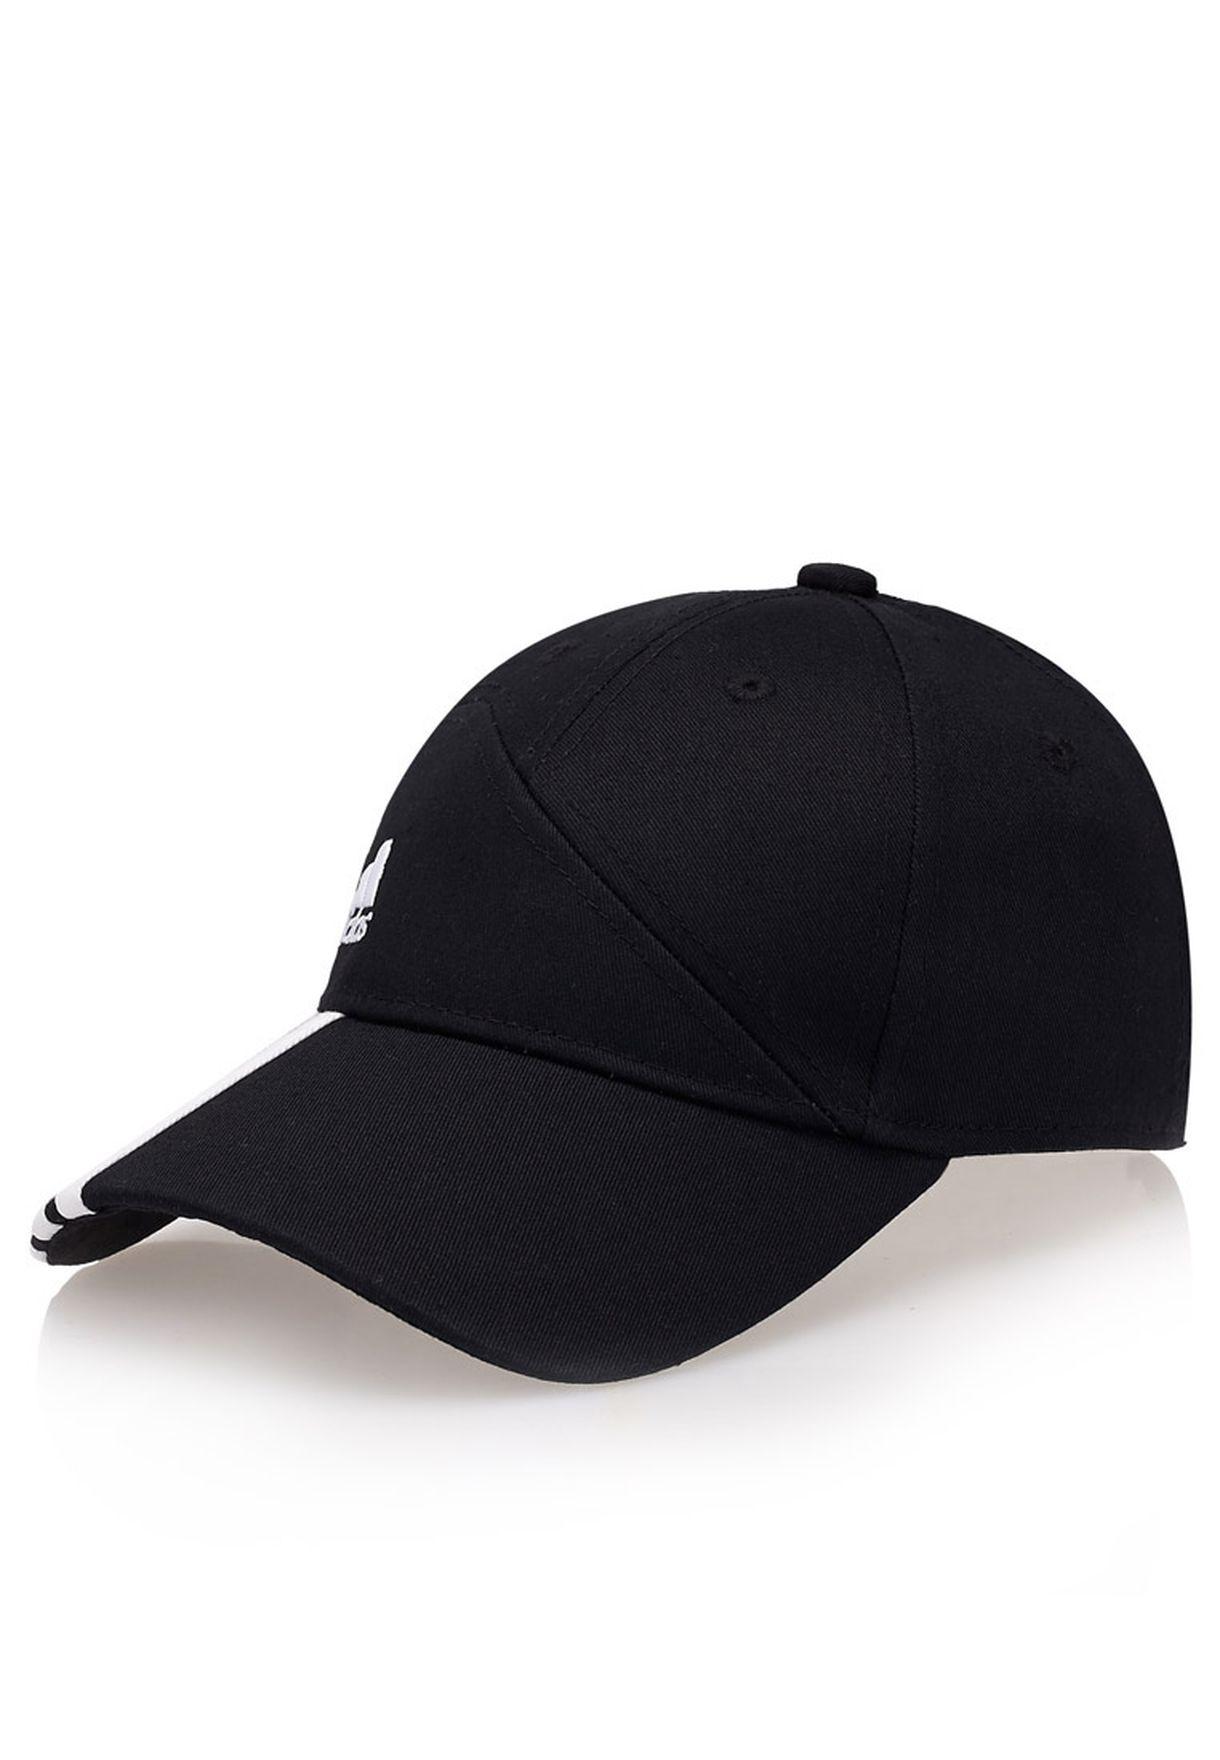 b10574bdea5 Shop adidas black Tiro Cap Z51691 for Men in Oman - AD476AT43OHG